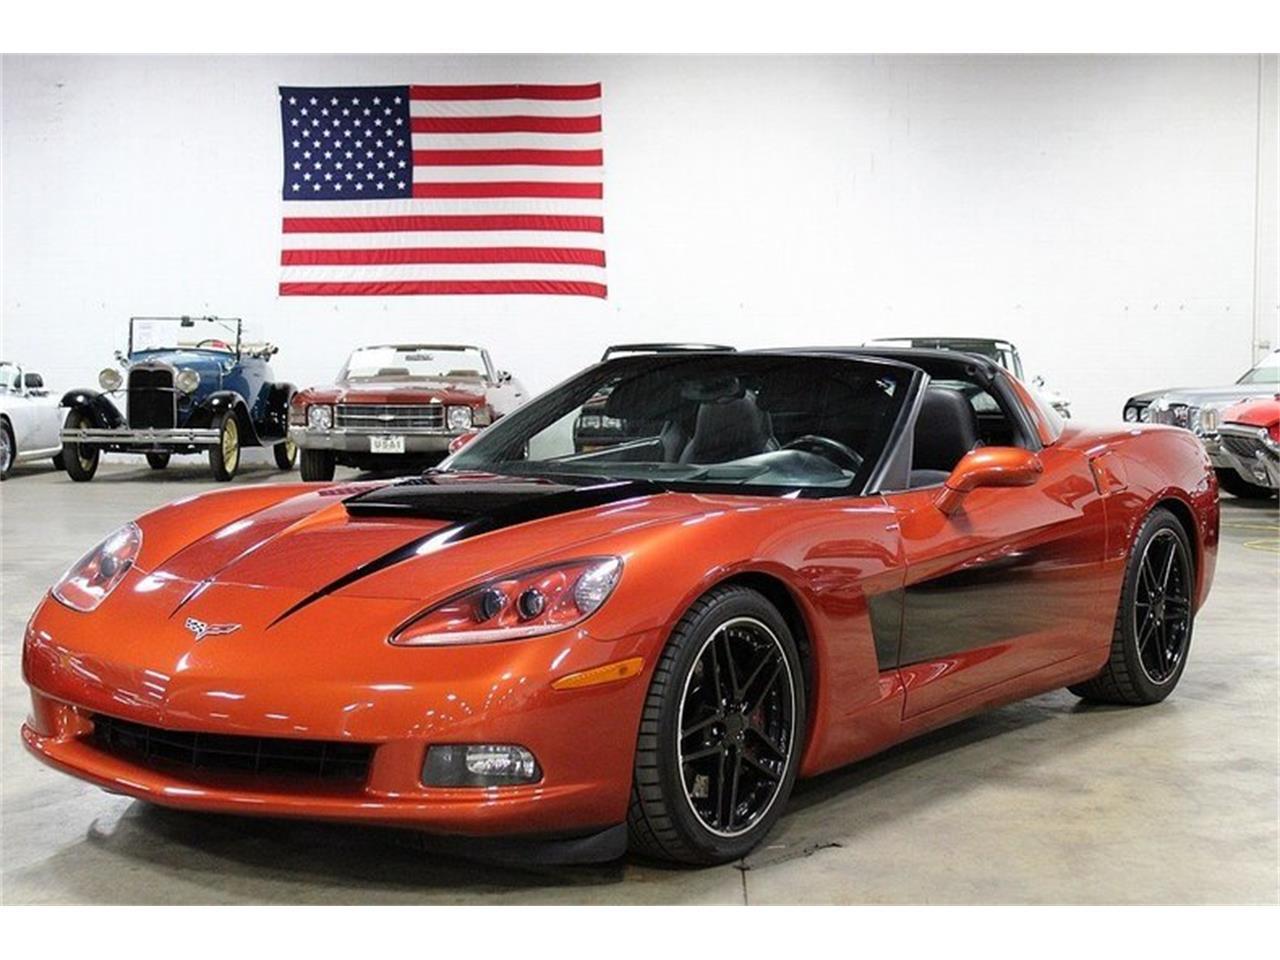 2005 Corvette For Sale >> For Sale 2005 Chevrolet Corvette In Kentwood Michigan